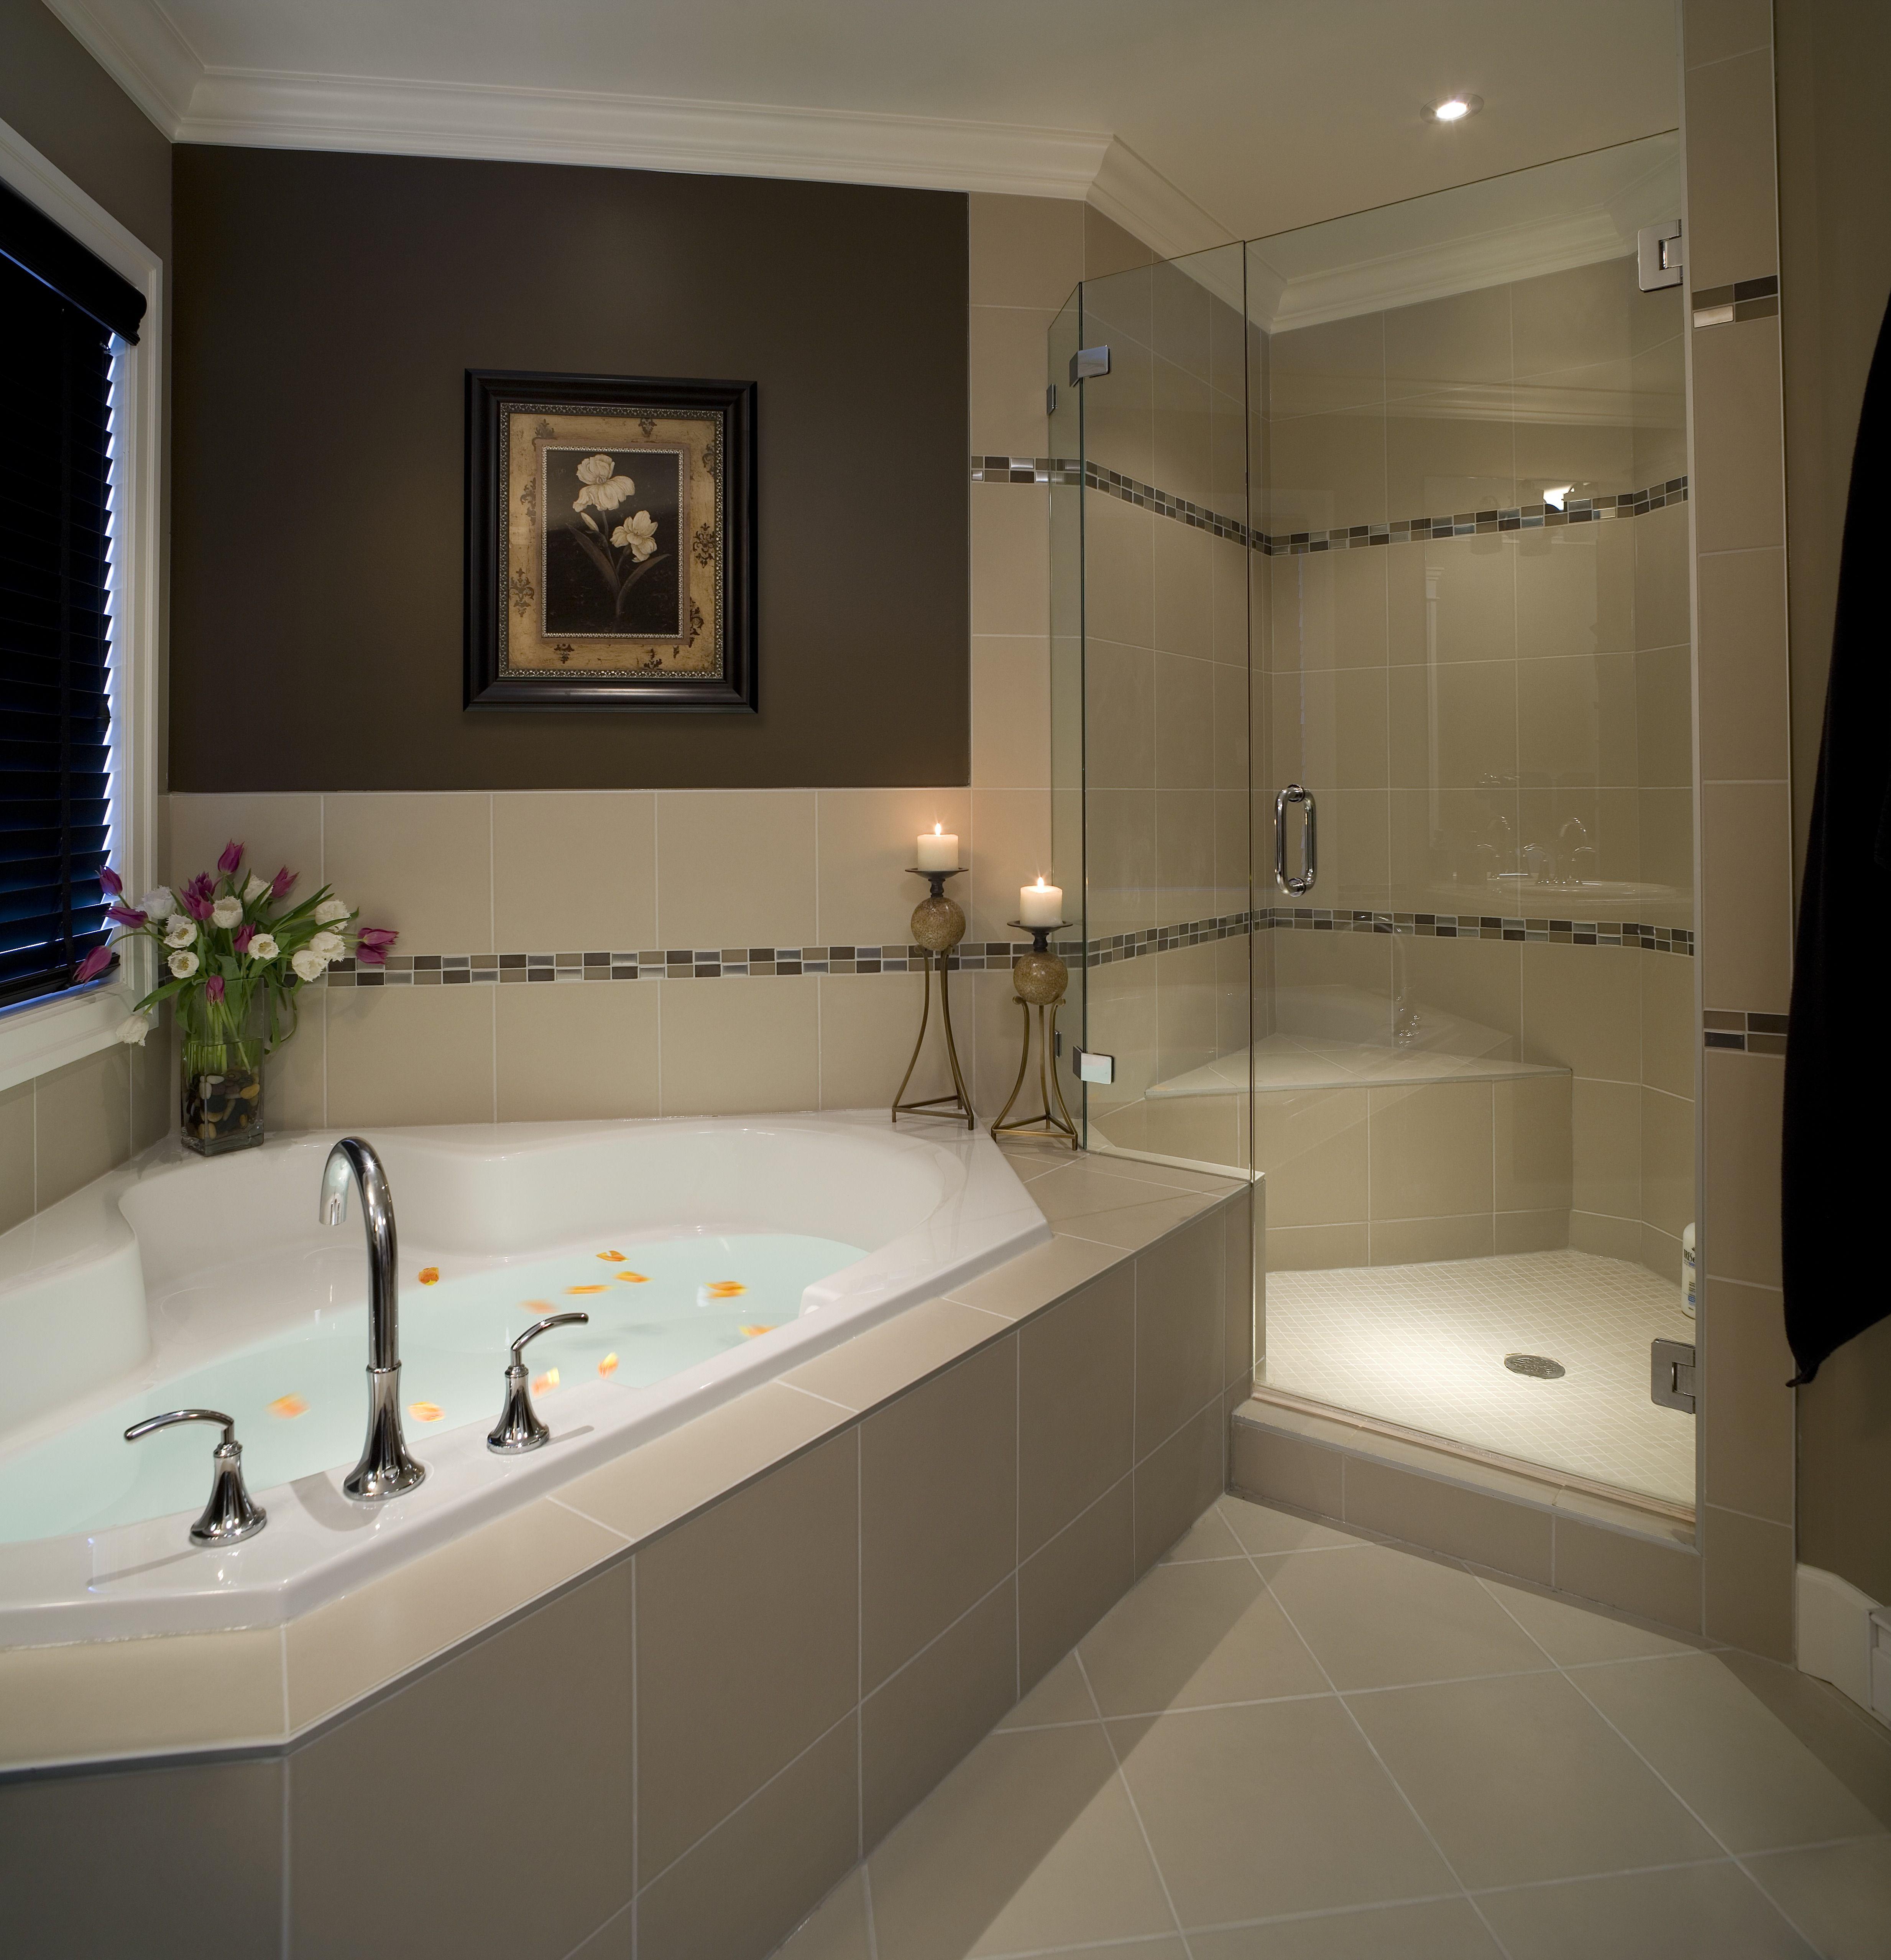 Elegantes badezimmerdesign  master bathrooms every couple dreams of  haus  pinterest